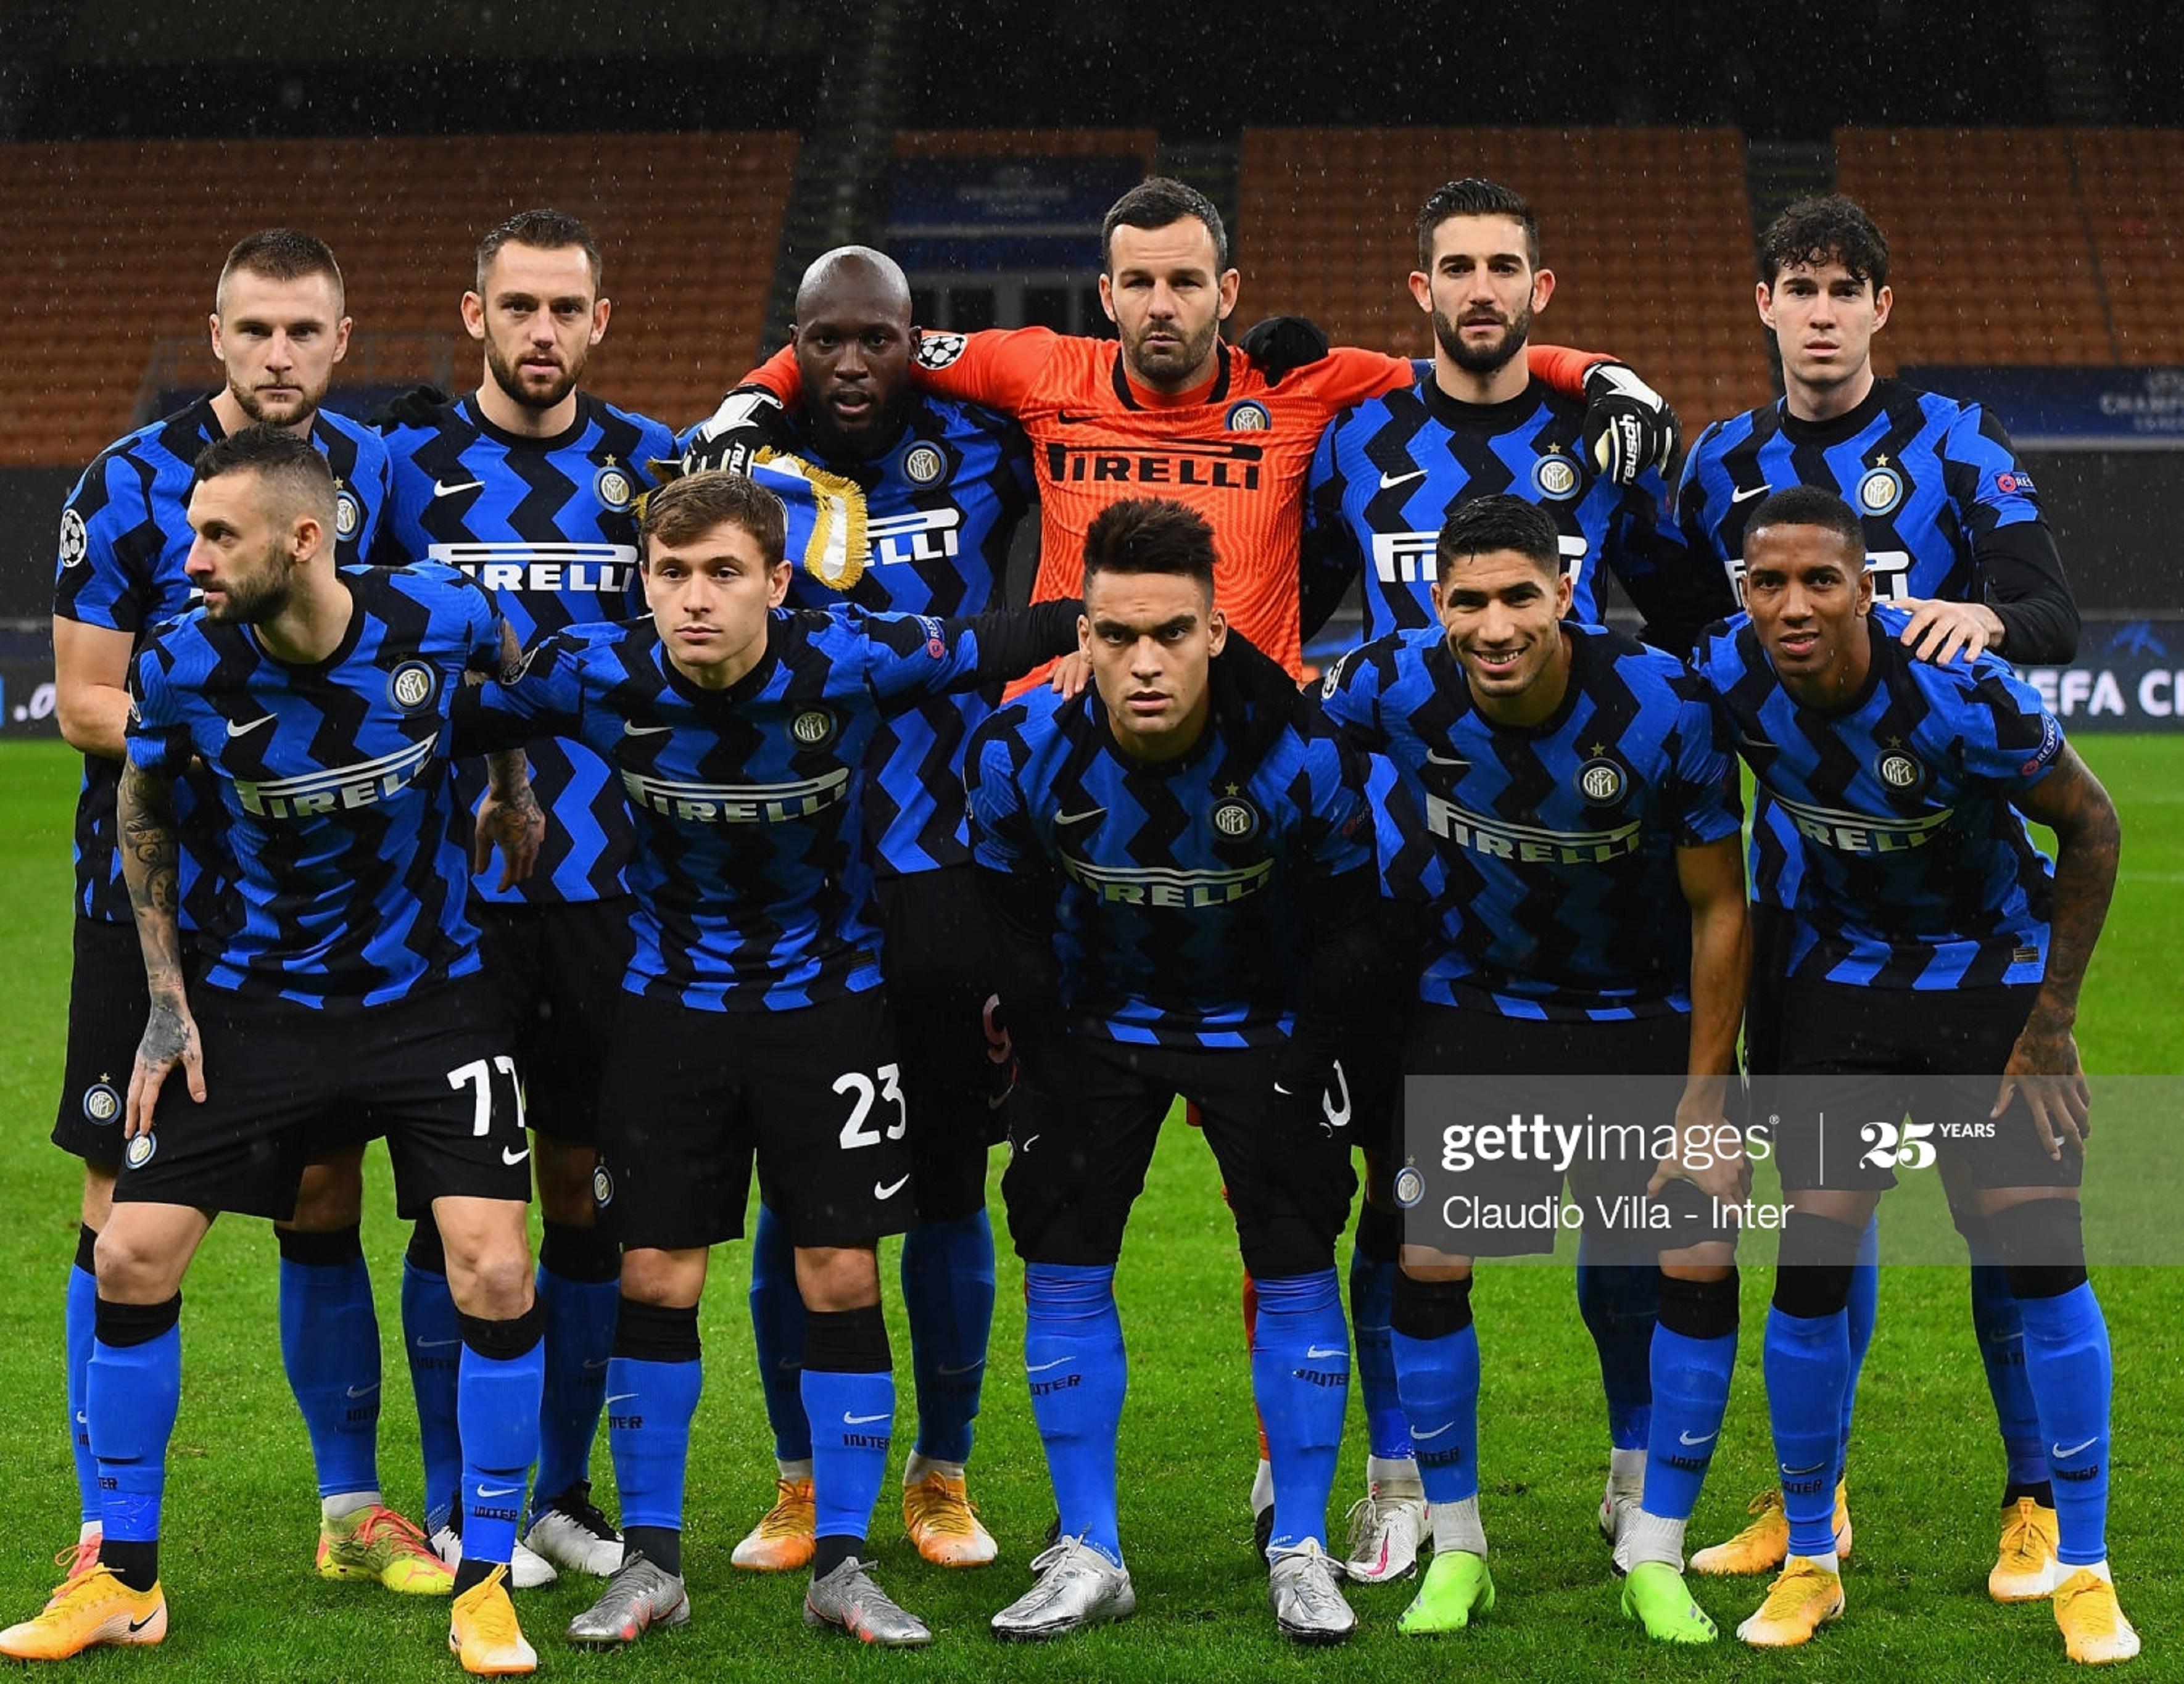 Интер (Италия) - Шахтёр (Украина) 0:0